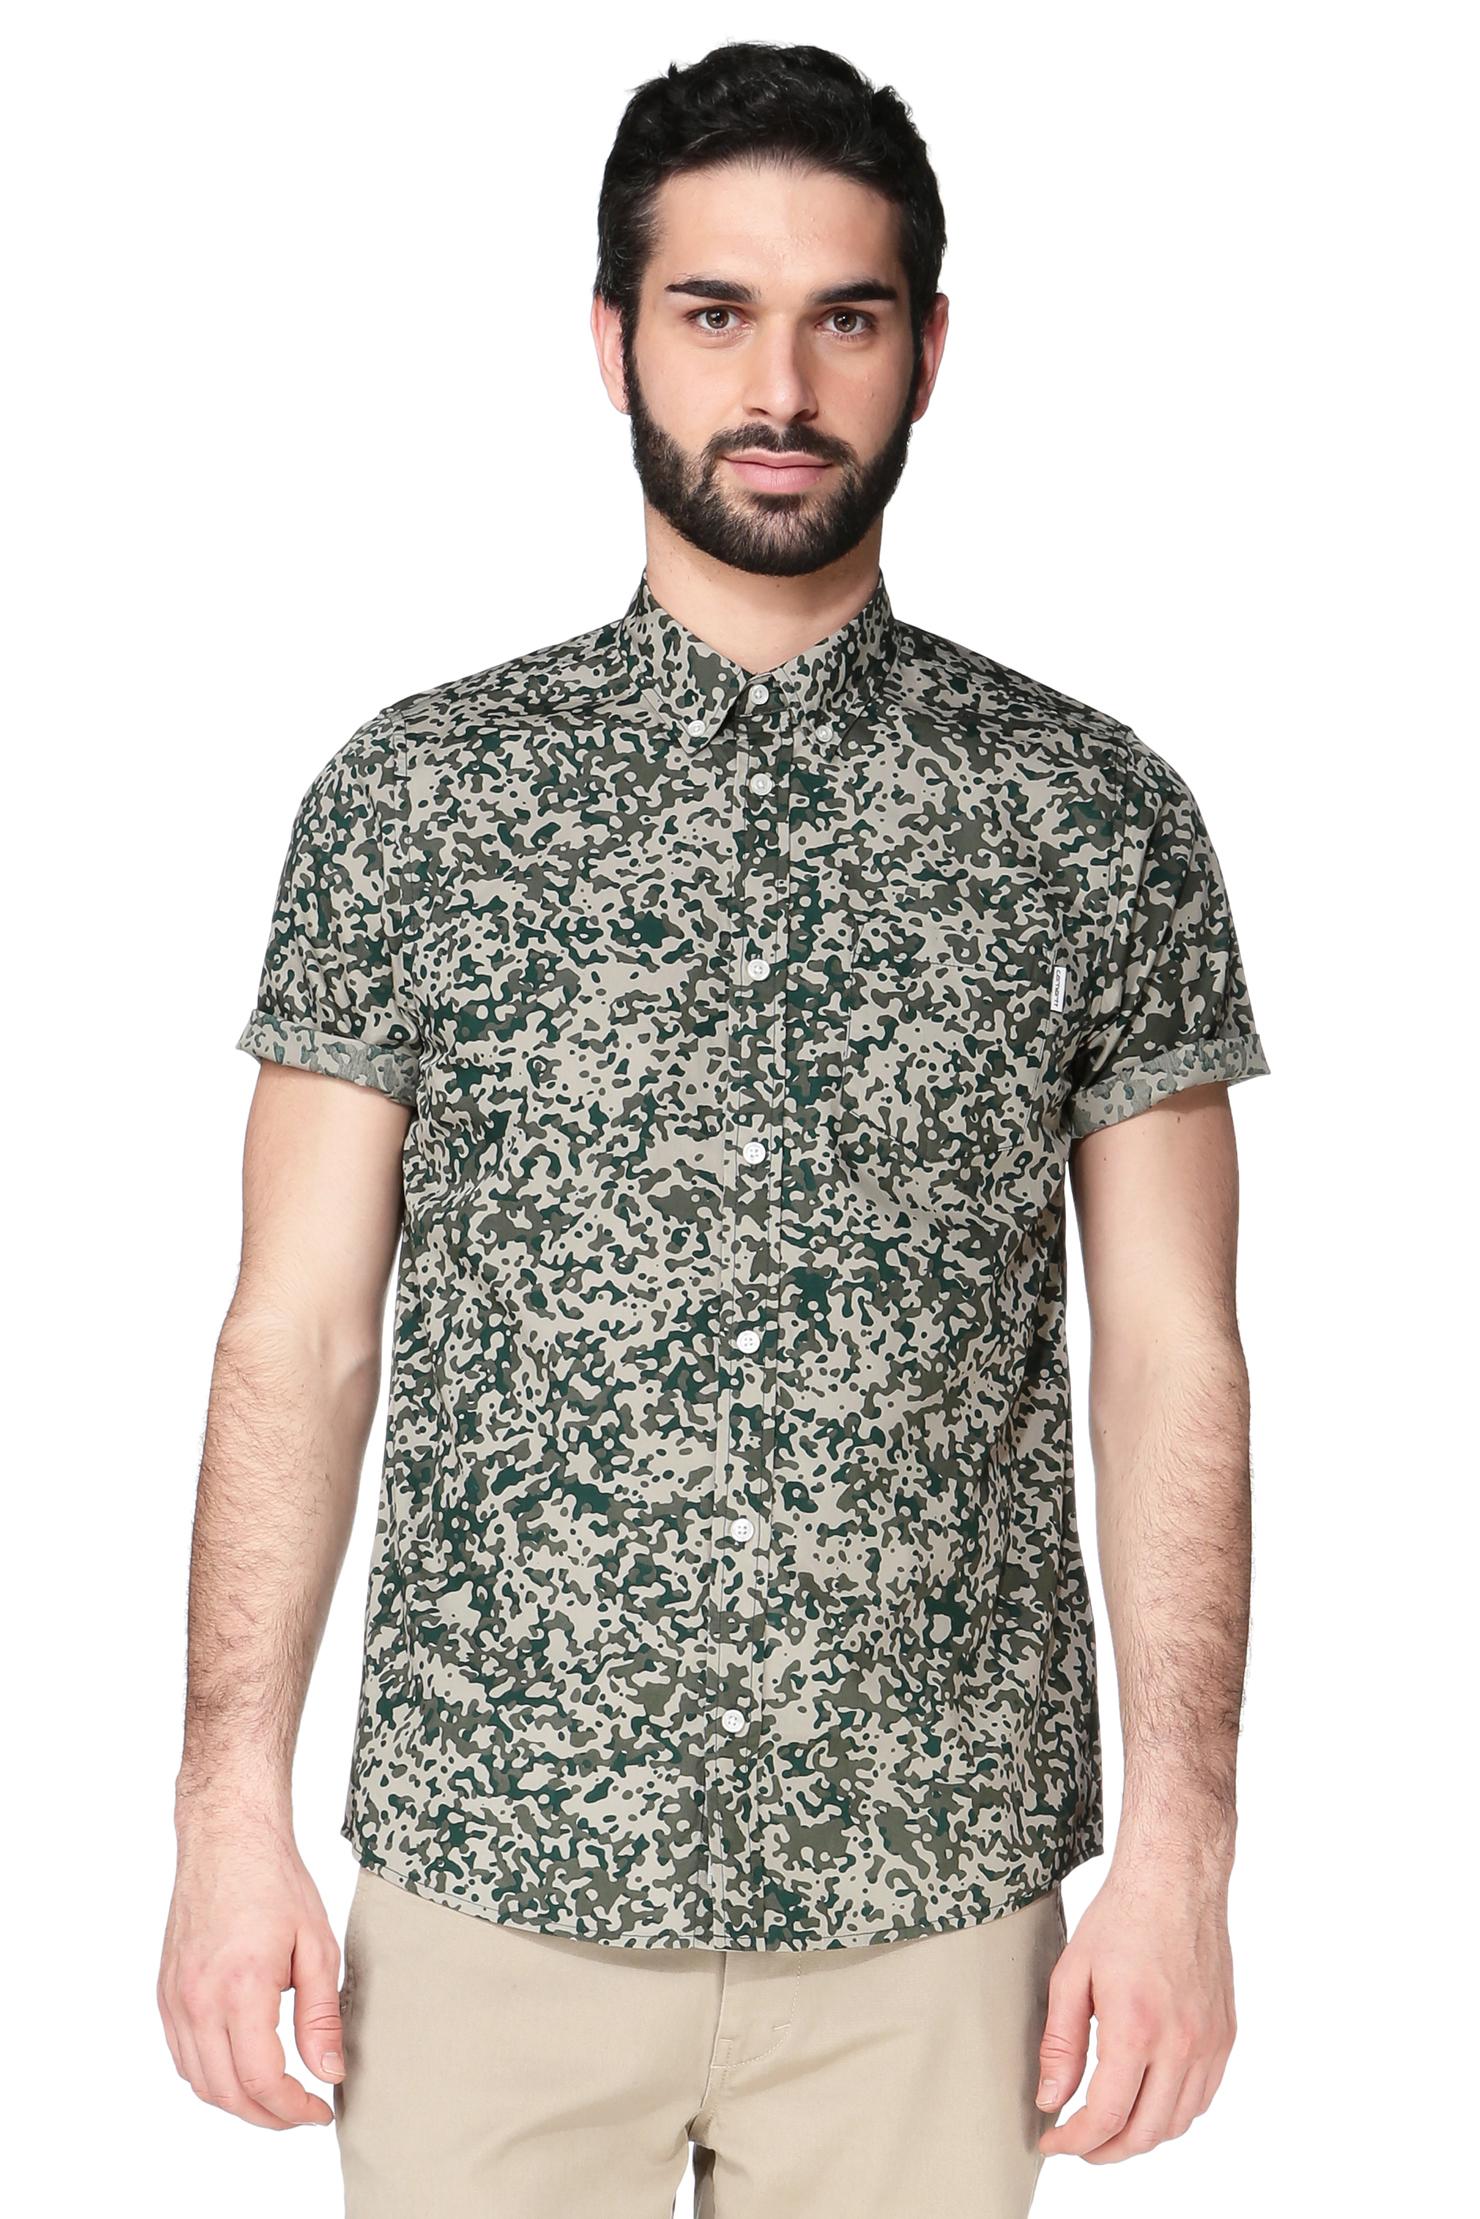 Carhartt Short Sleeve Shirt in Green for Men